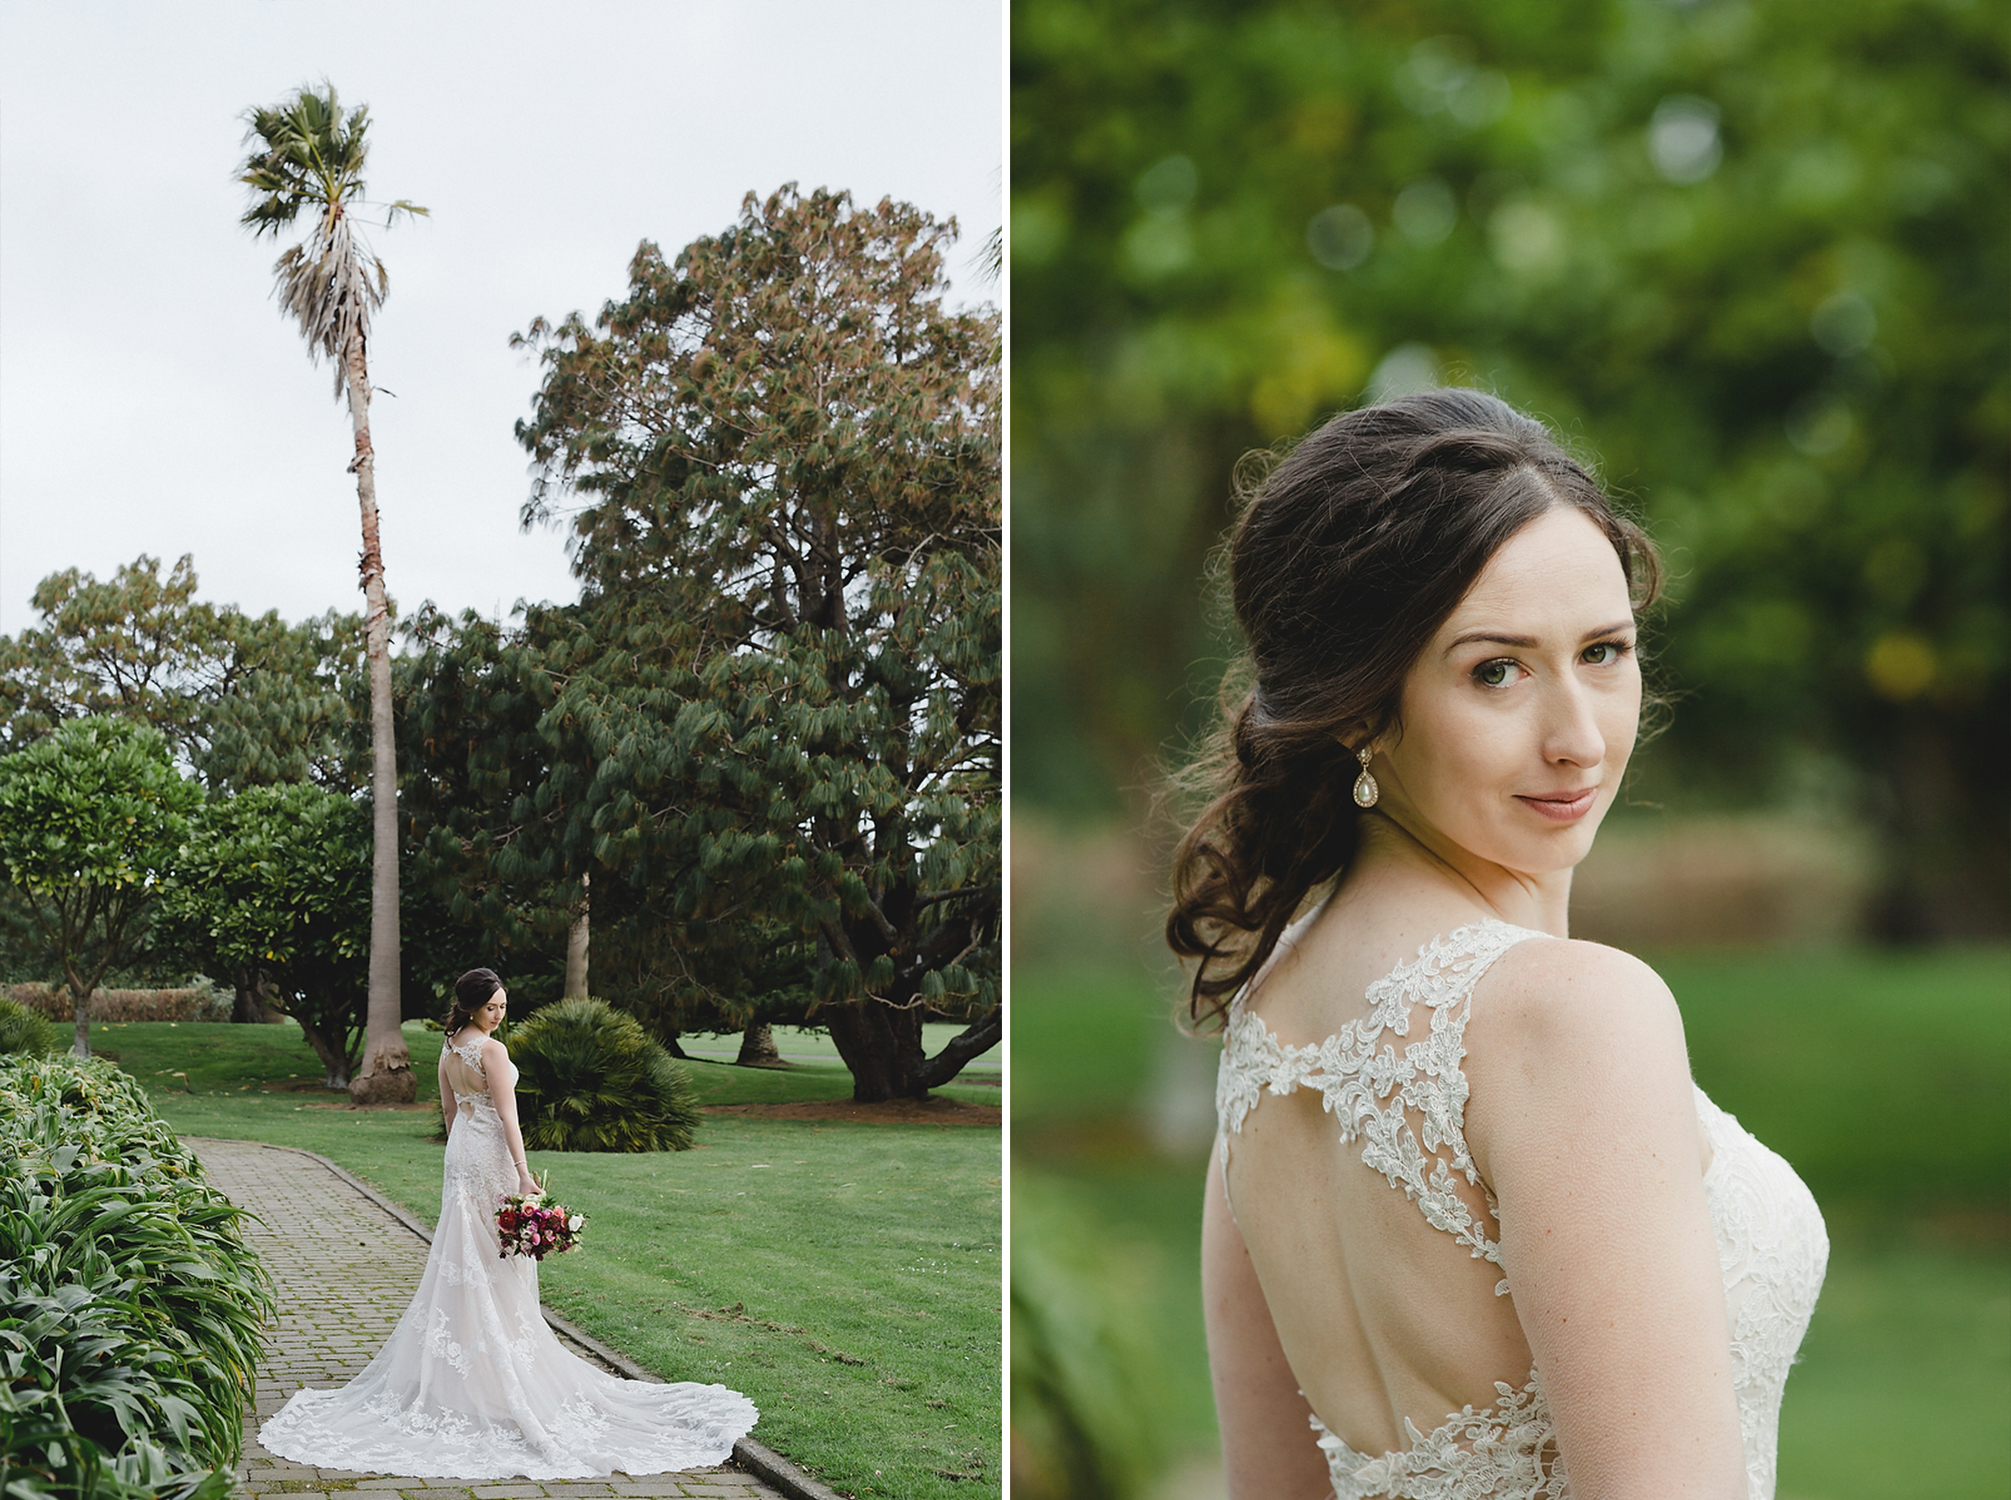 wellington wedding photography NZ - 0157.JPG